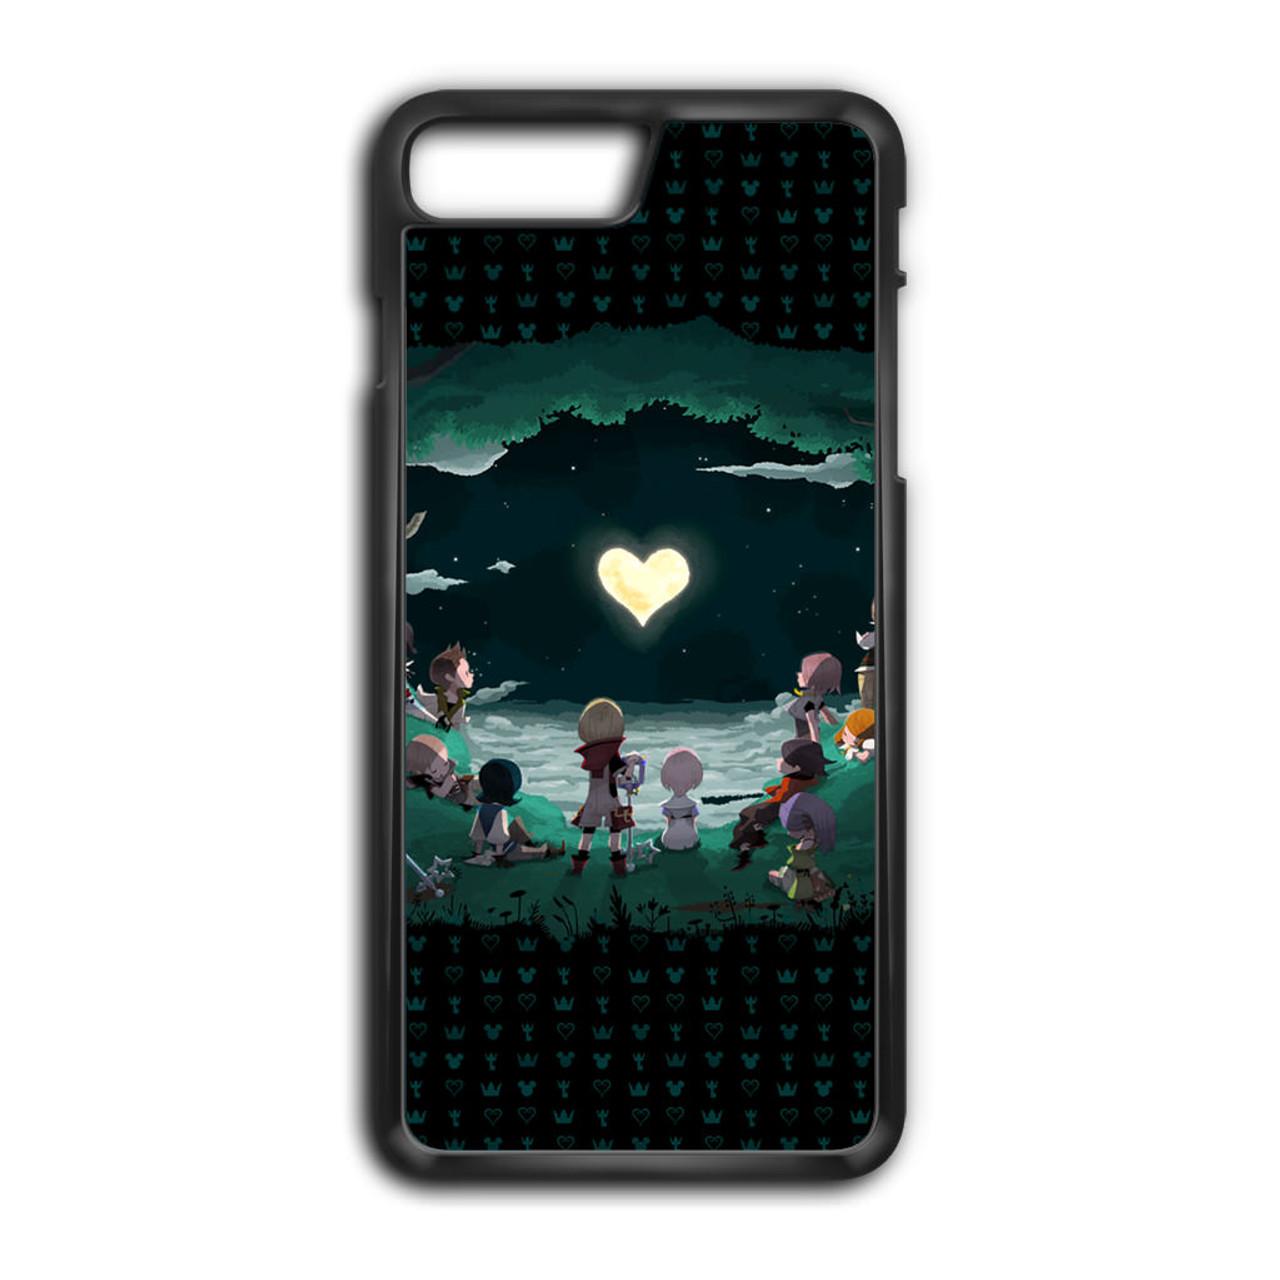 kingdom hearts iphone 7 plus case